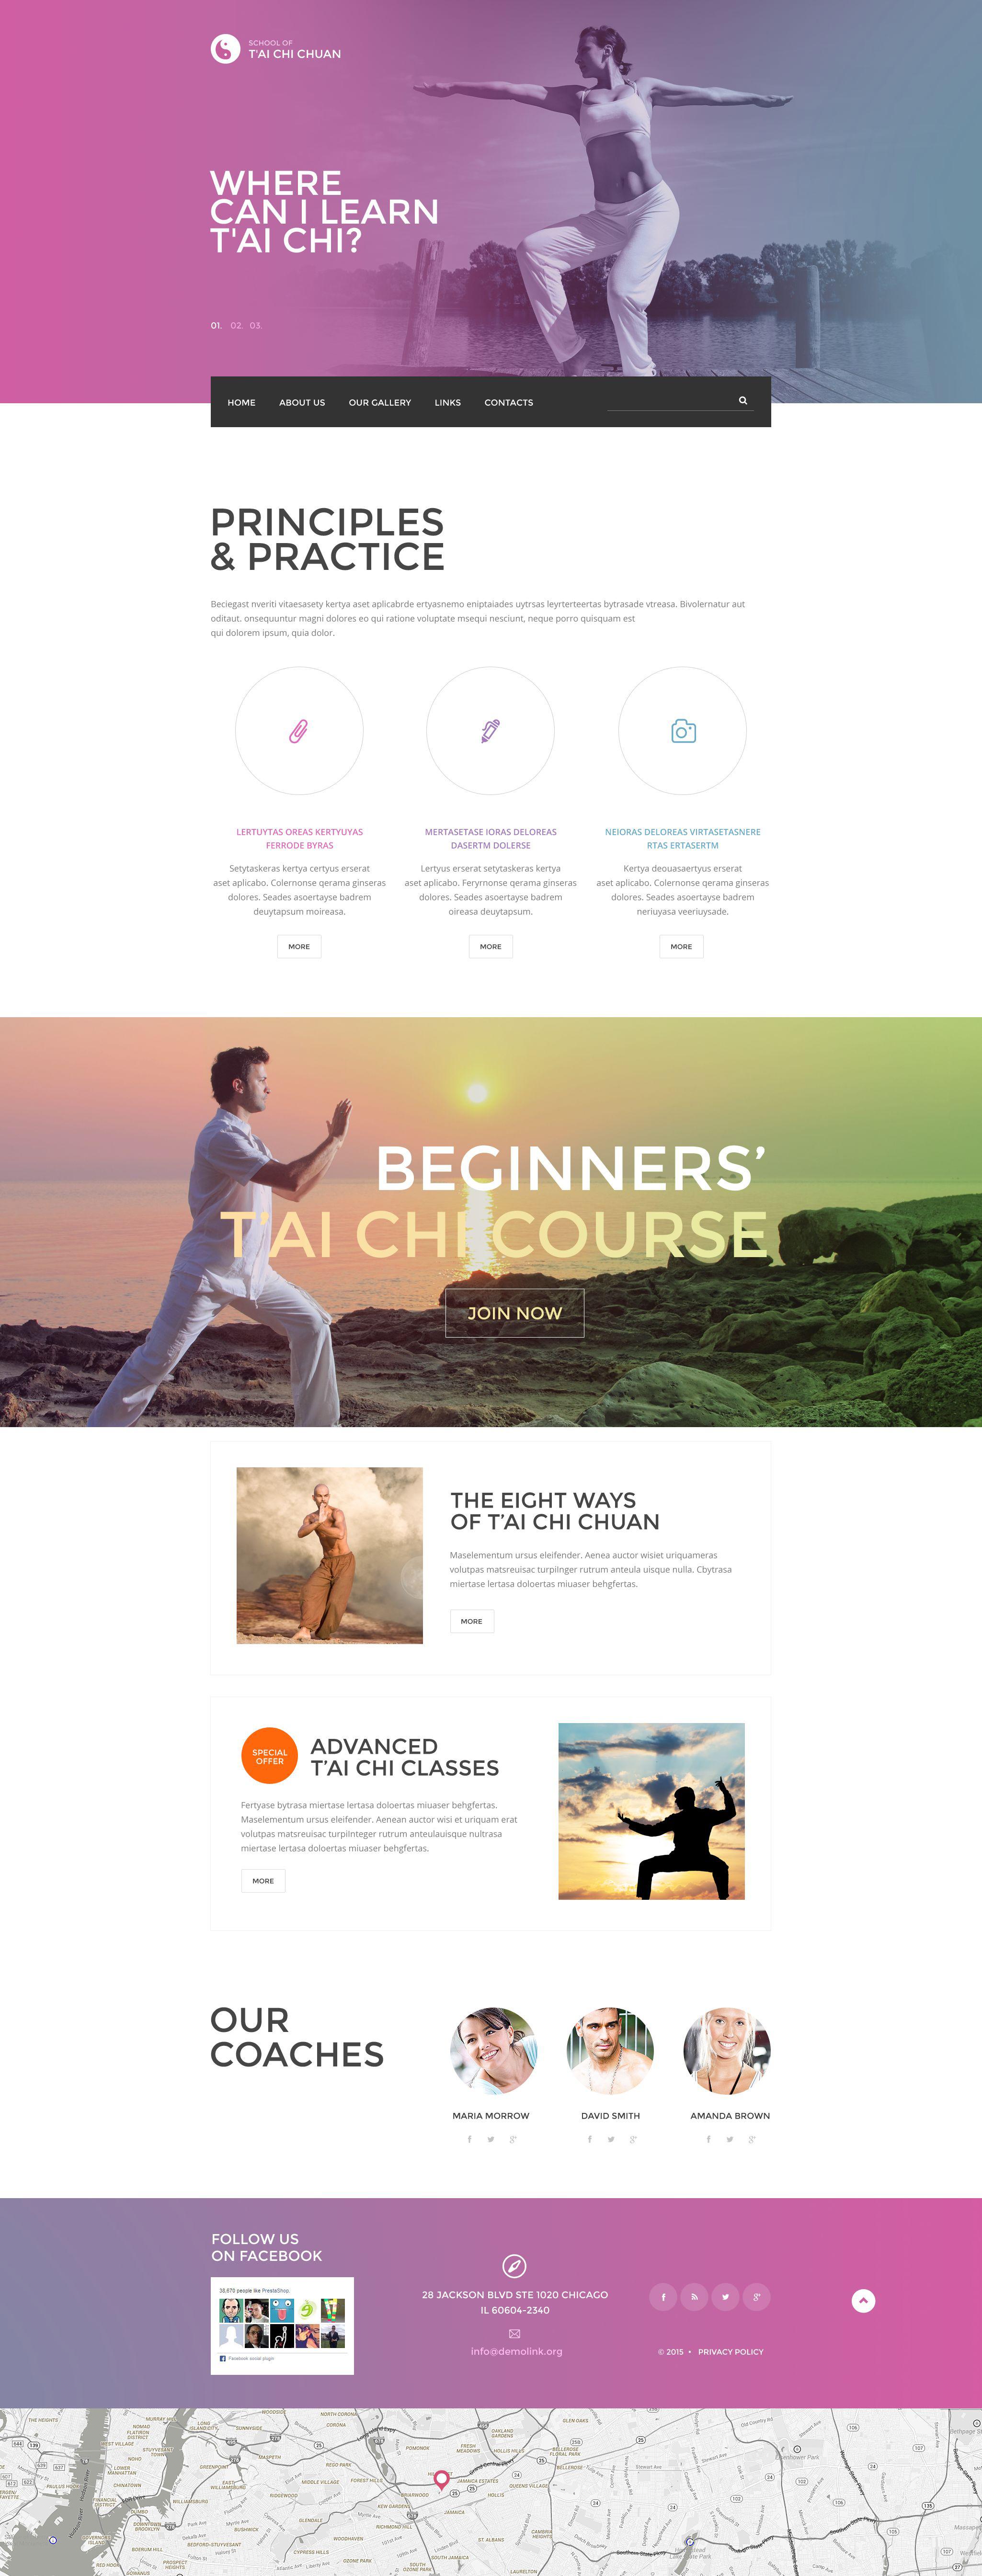 Tai Chi Chuan Website Template